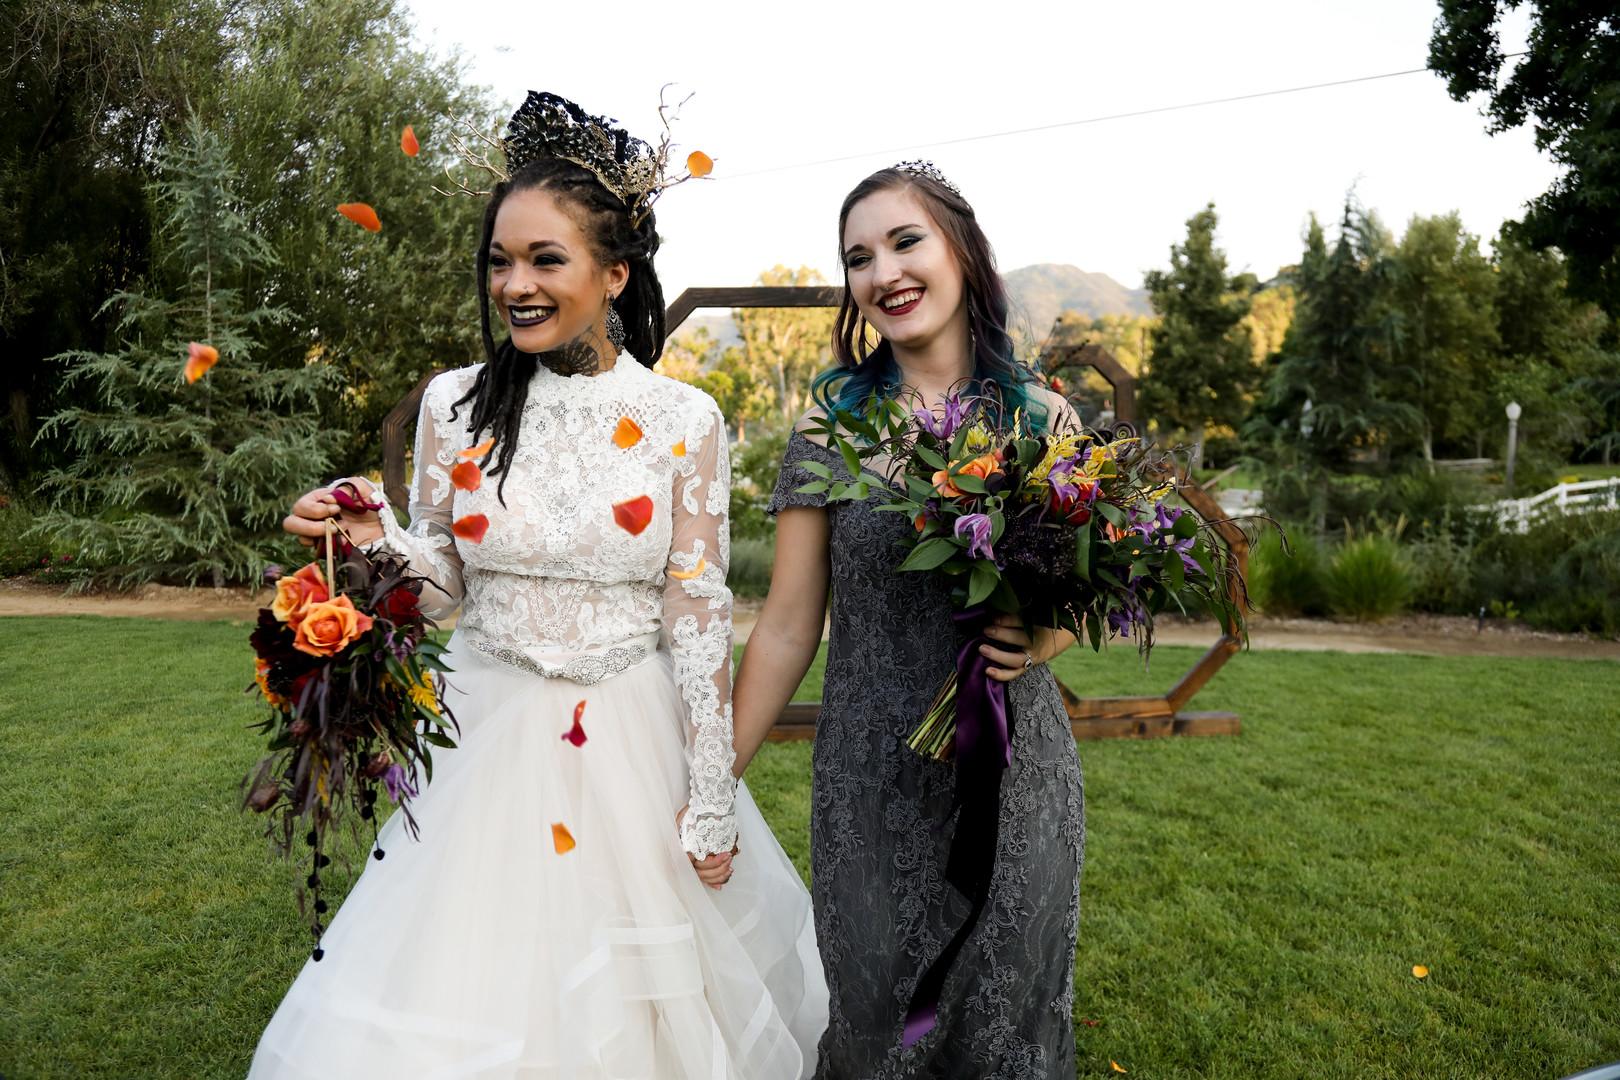 Halloween Wedding Photography, Brides walking down the aisle